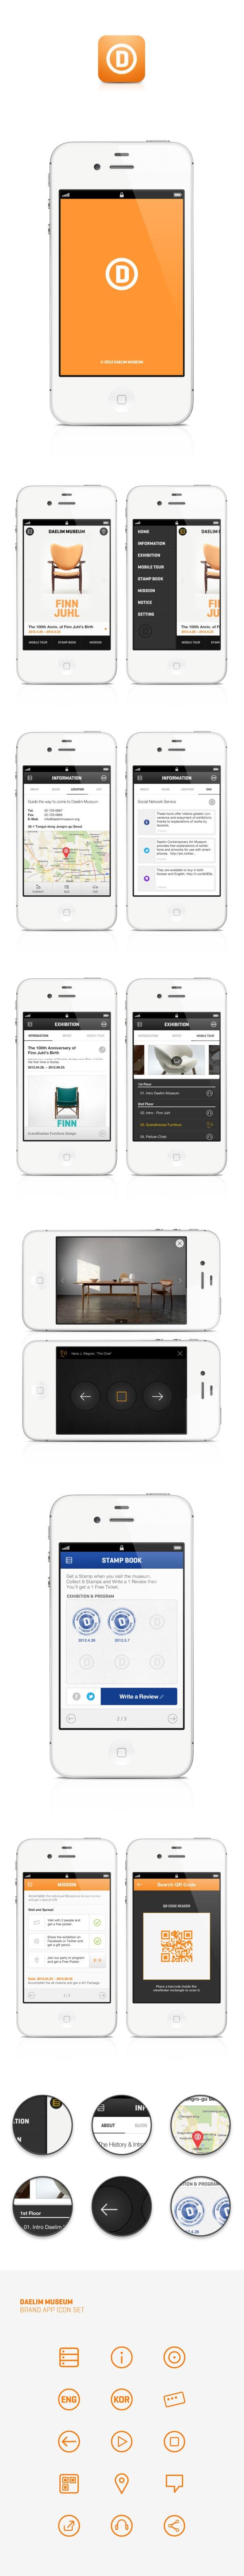 Daelim Museum Mobile App by Jason Jun, via Behance *** Daelim Contemporary Art Museum. Planning, Design and Development by  Blinkfactory, Inc.